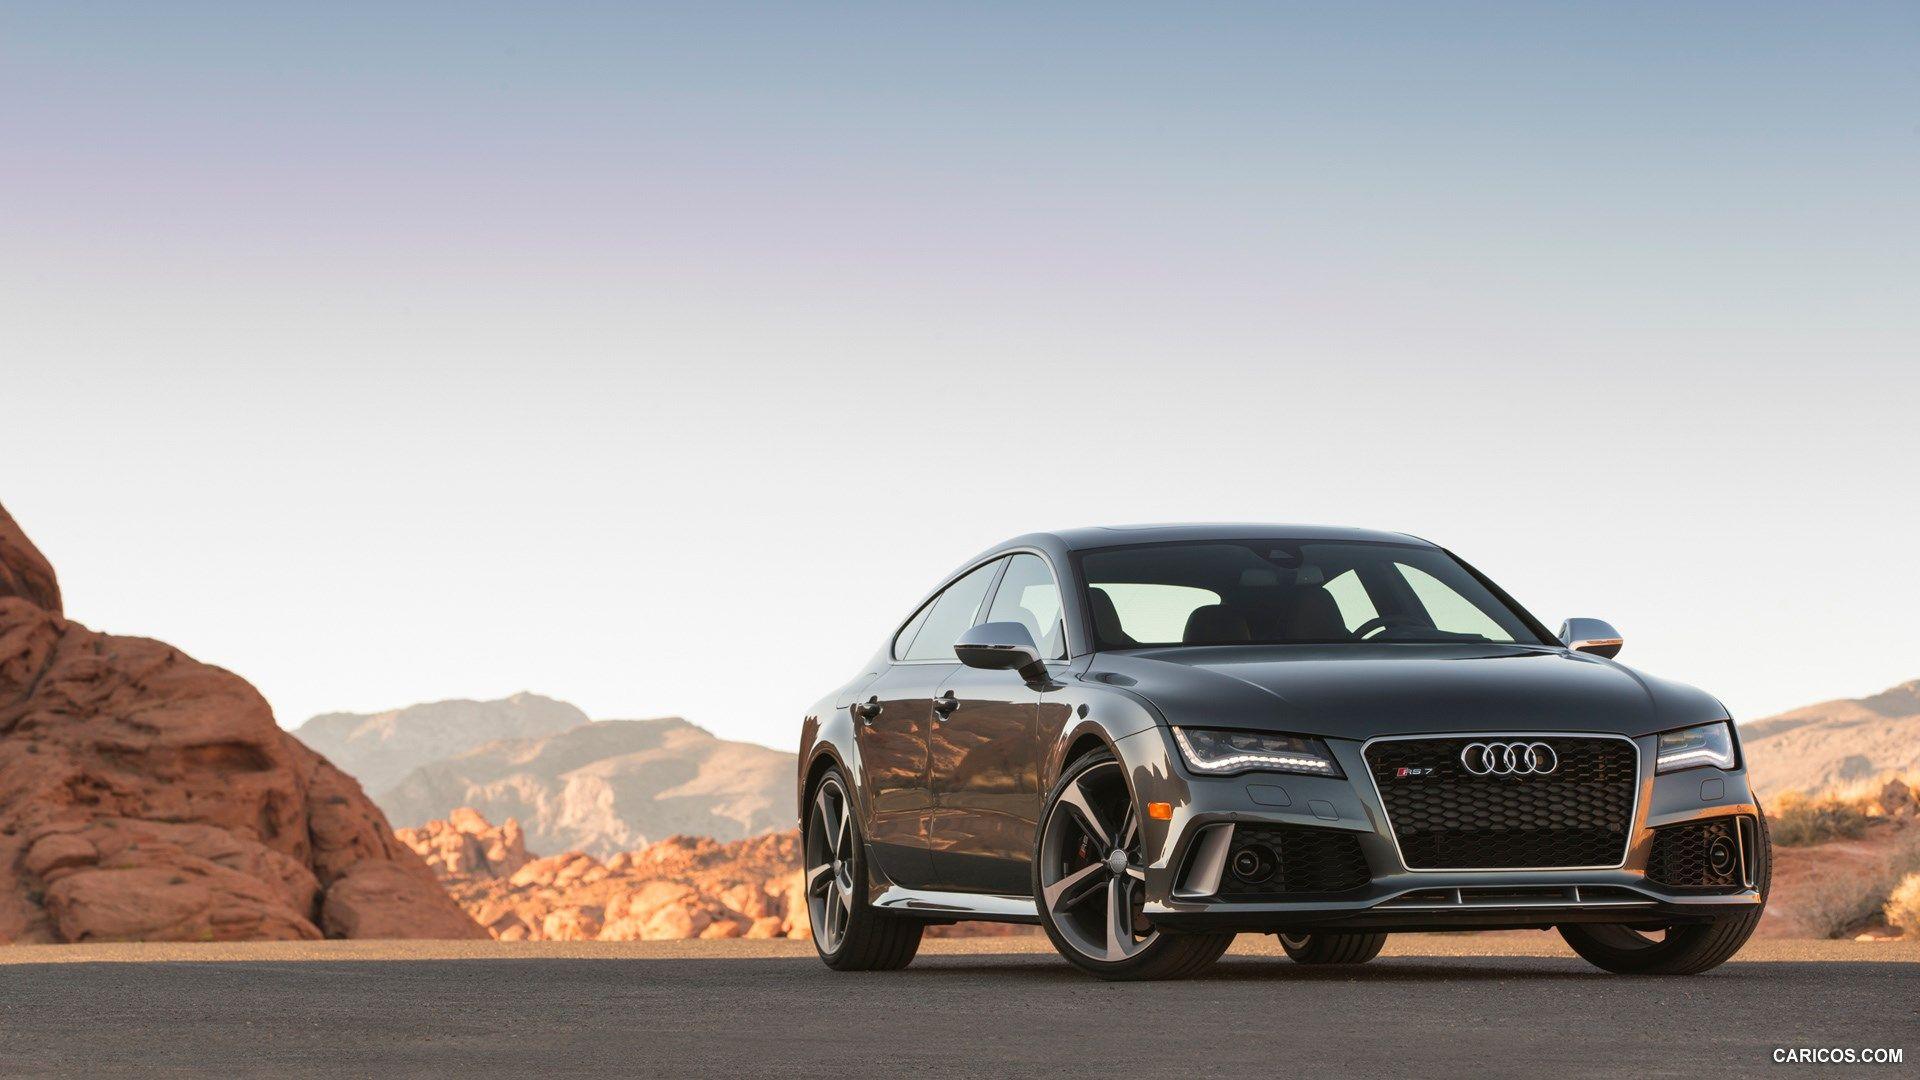 Audi Rs7 Background Audi Rs7 Audi Rs Audi